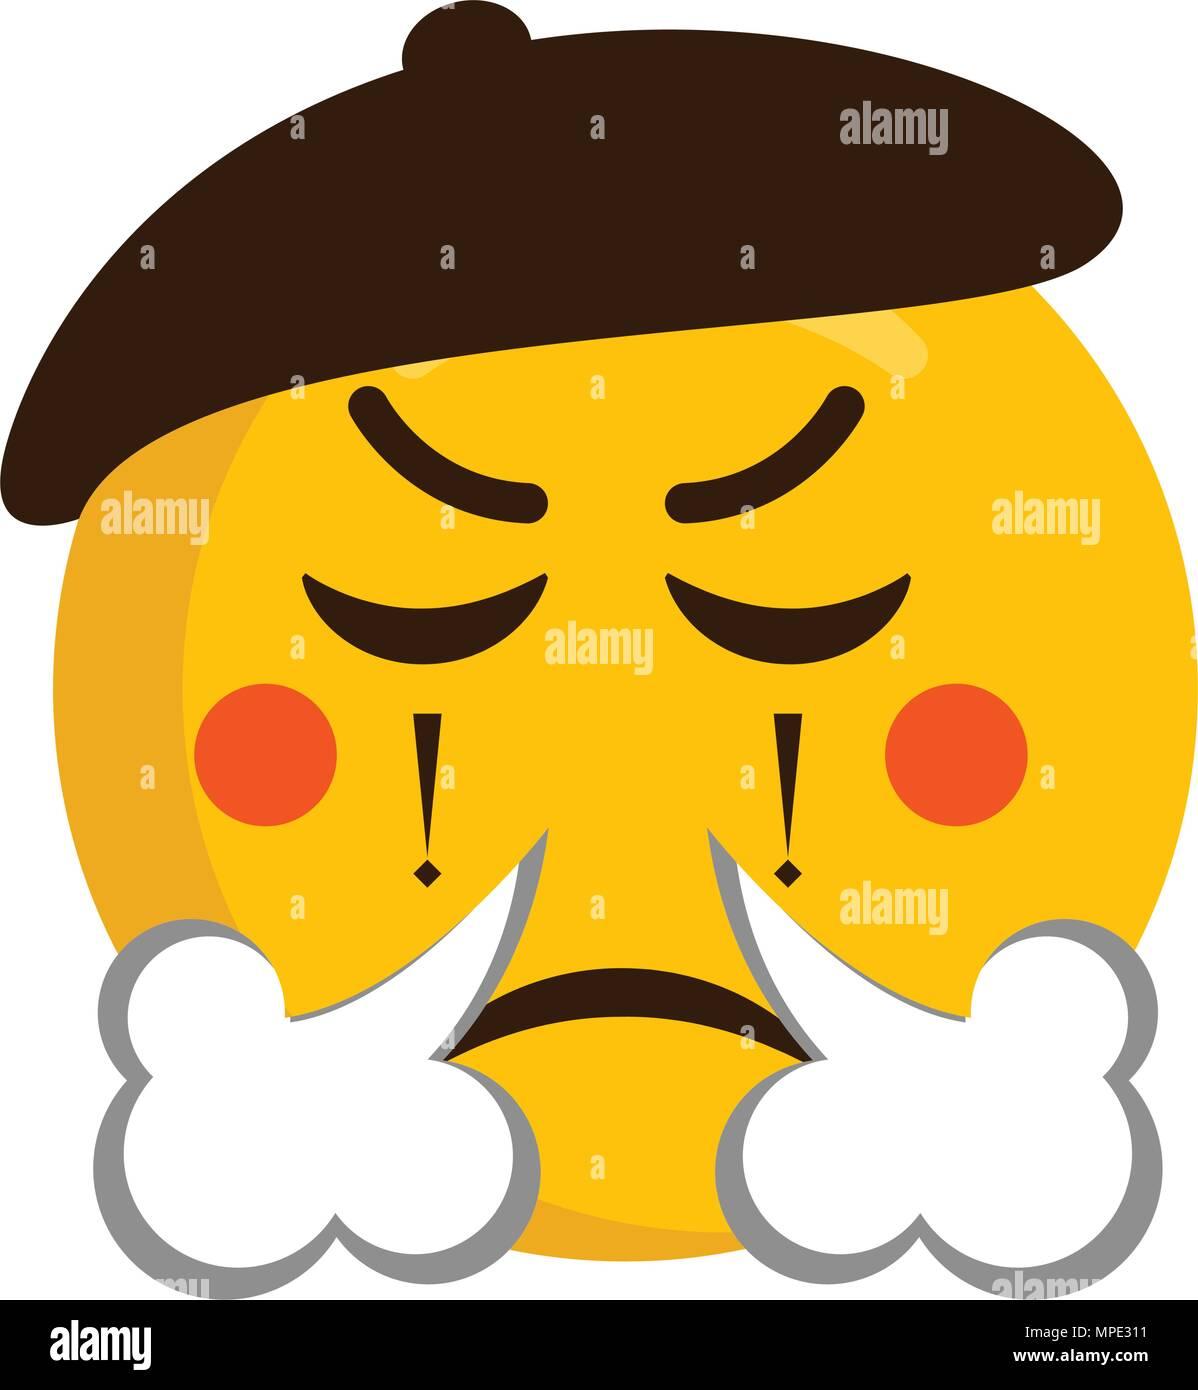 Angry mime emoji icon - Stock Vector